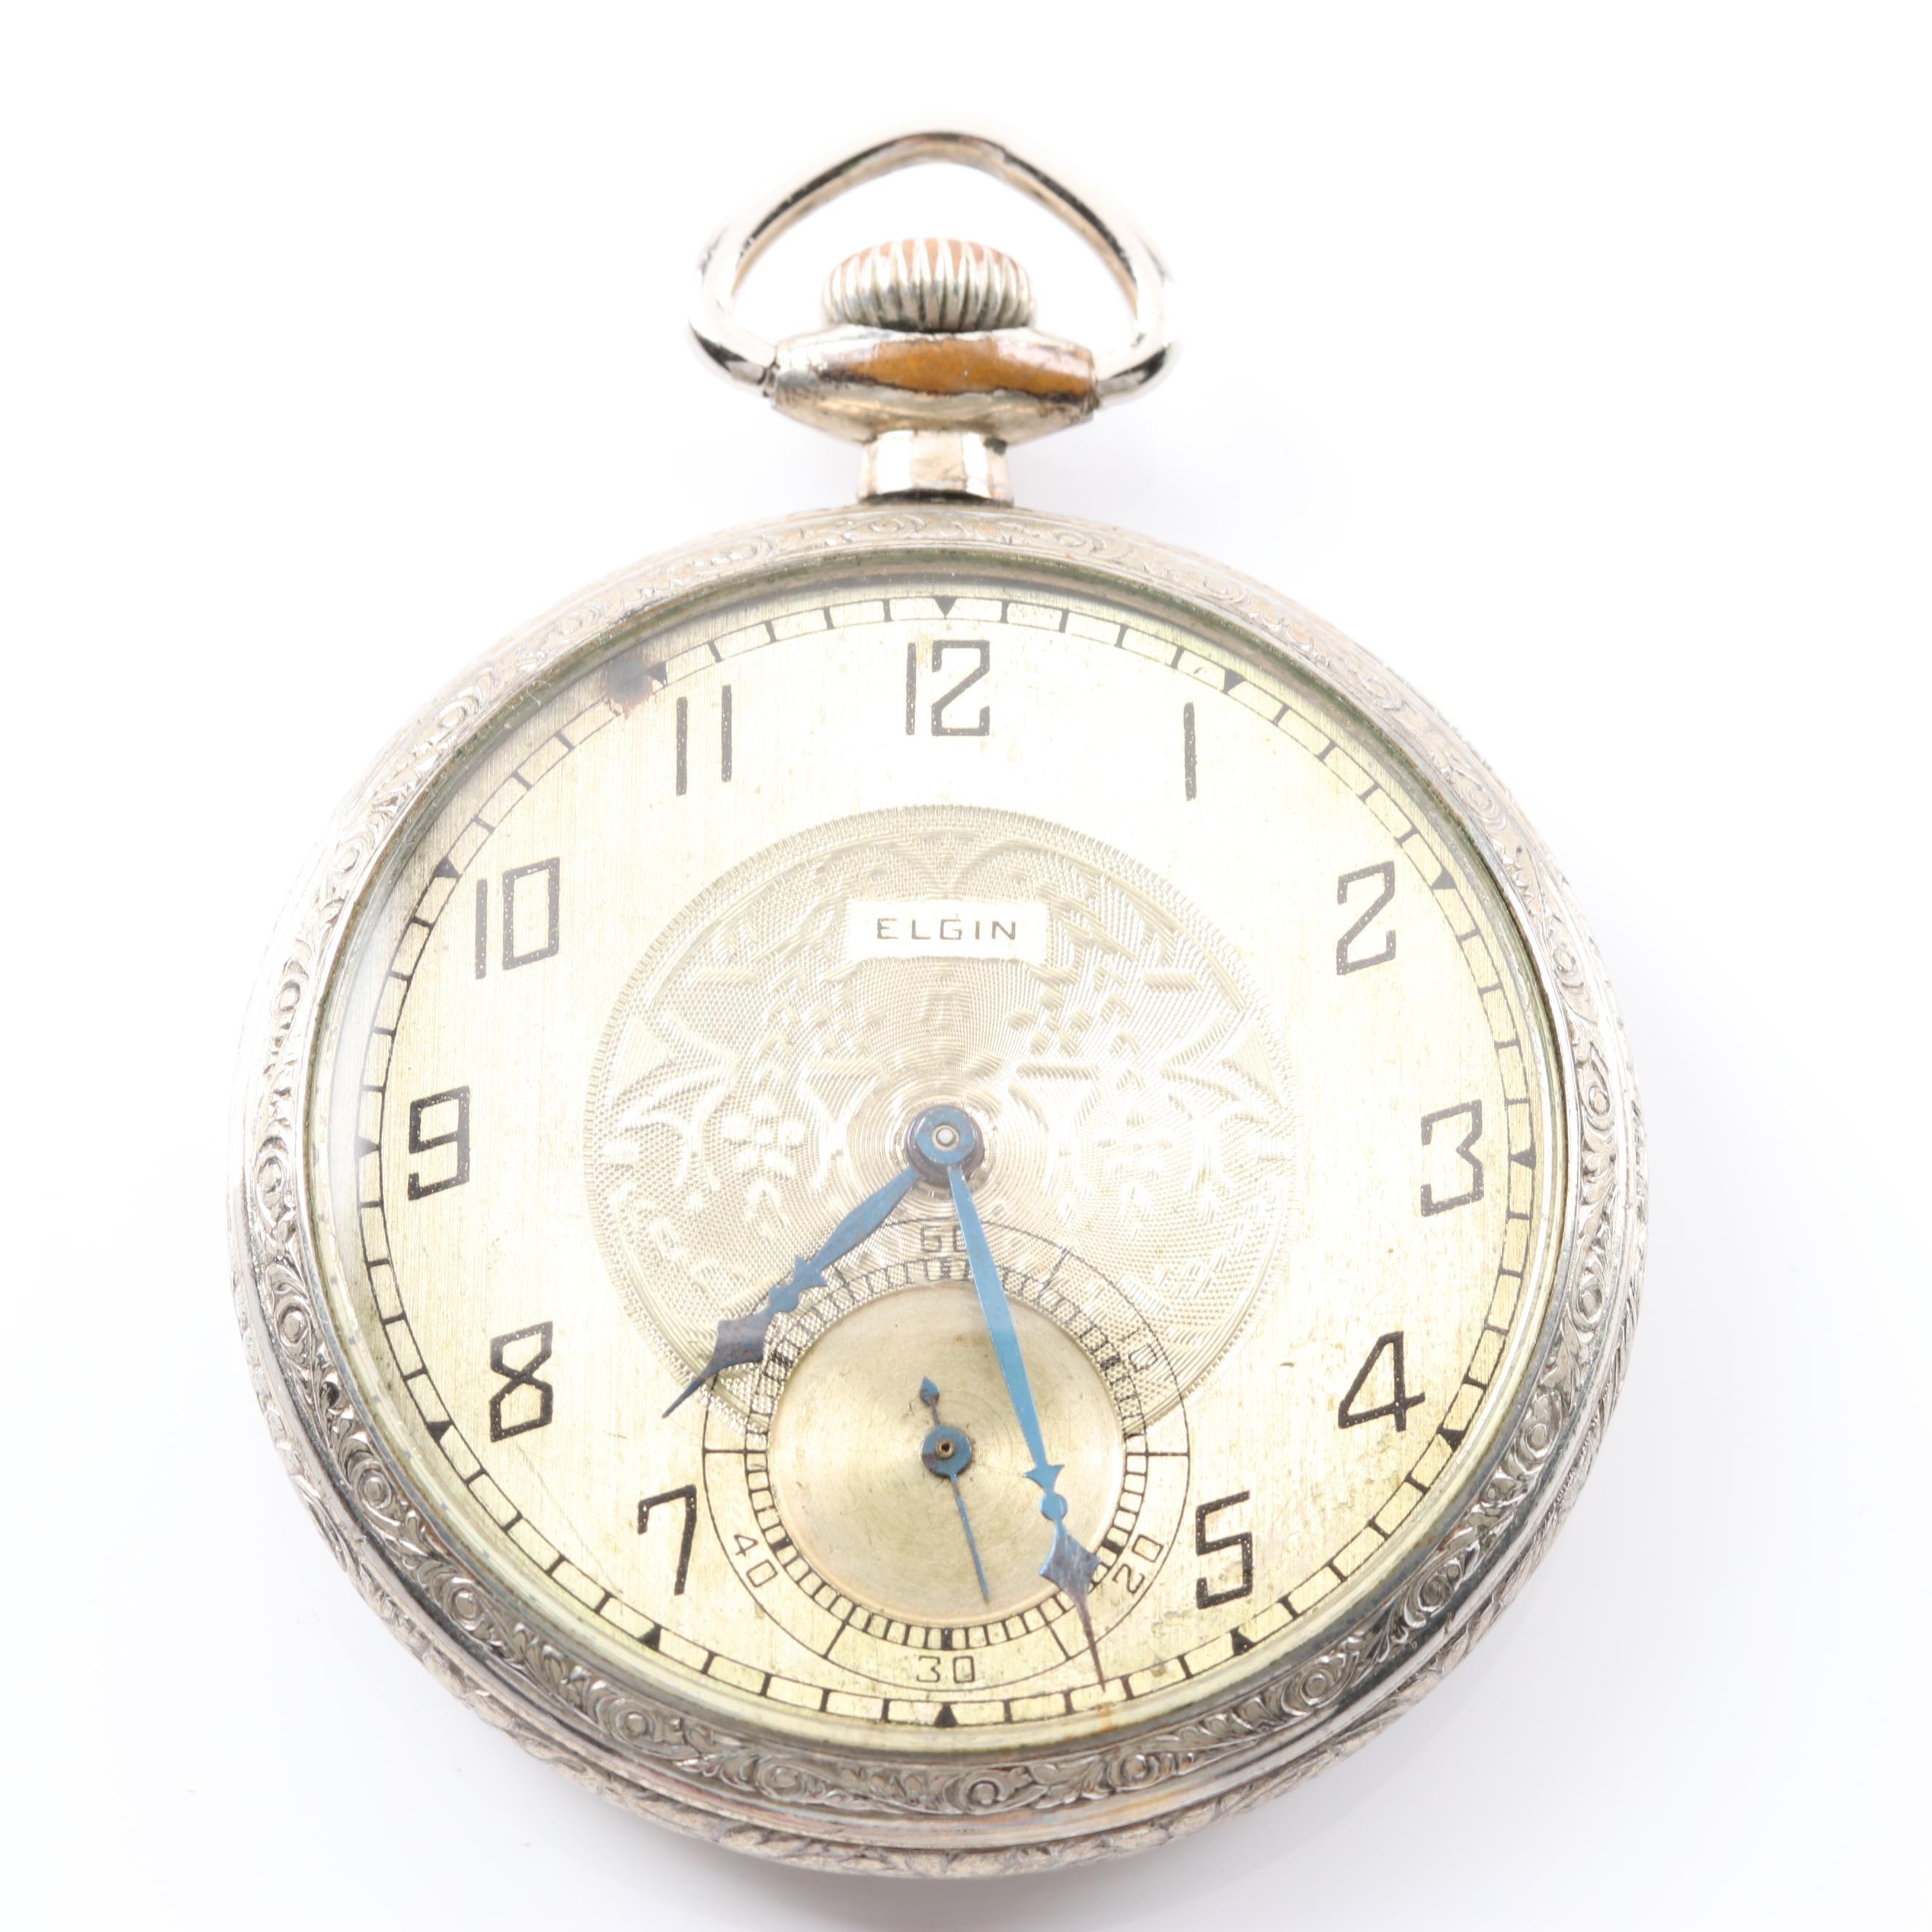 Plated Elgin Pocket Watch